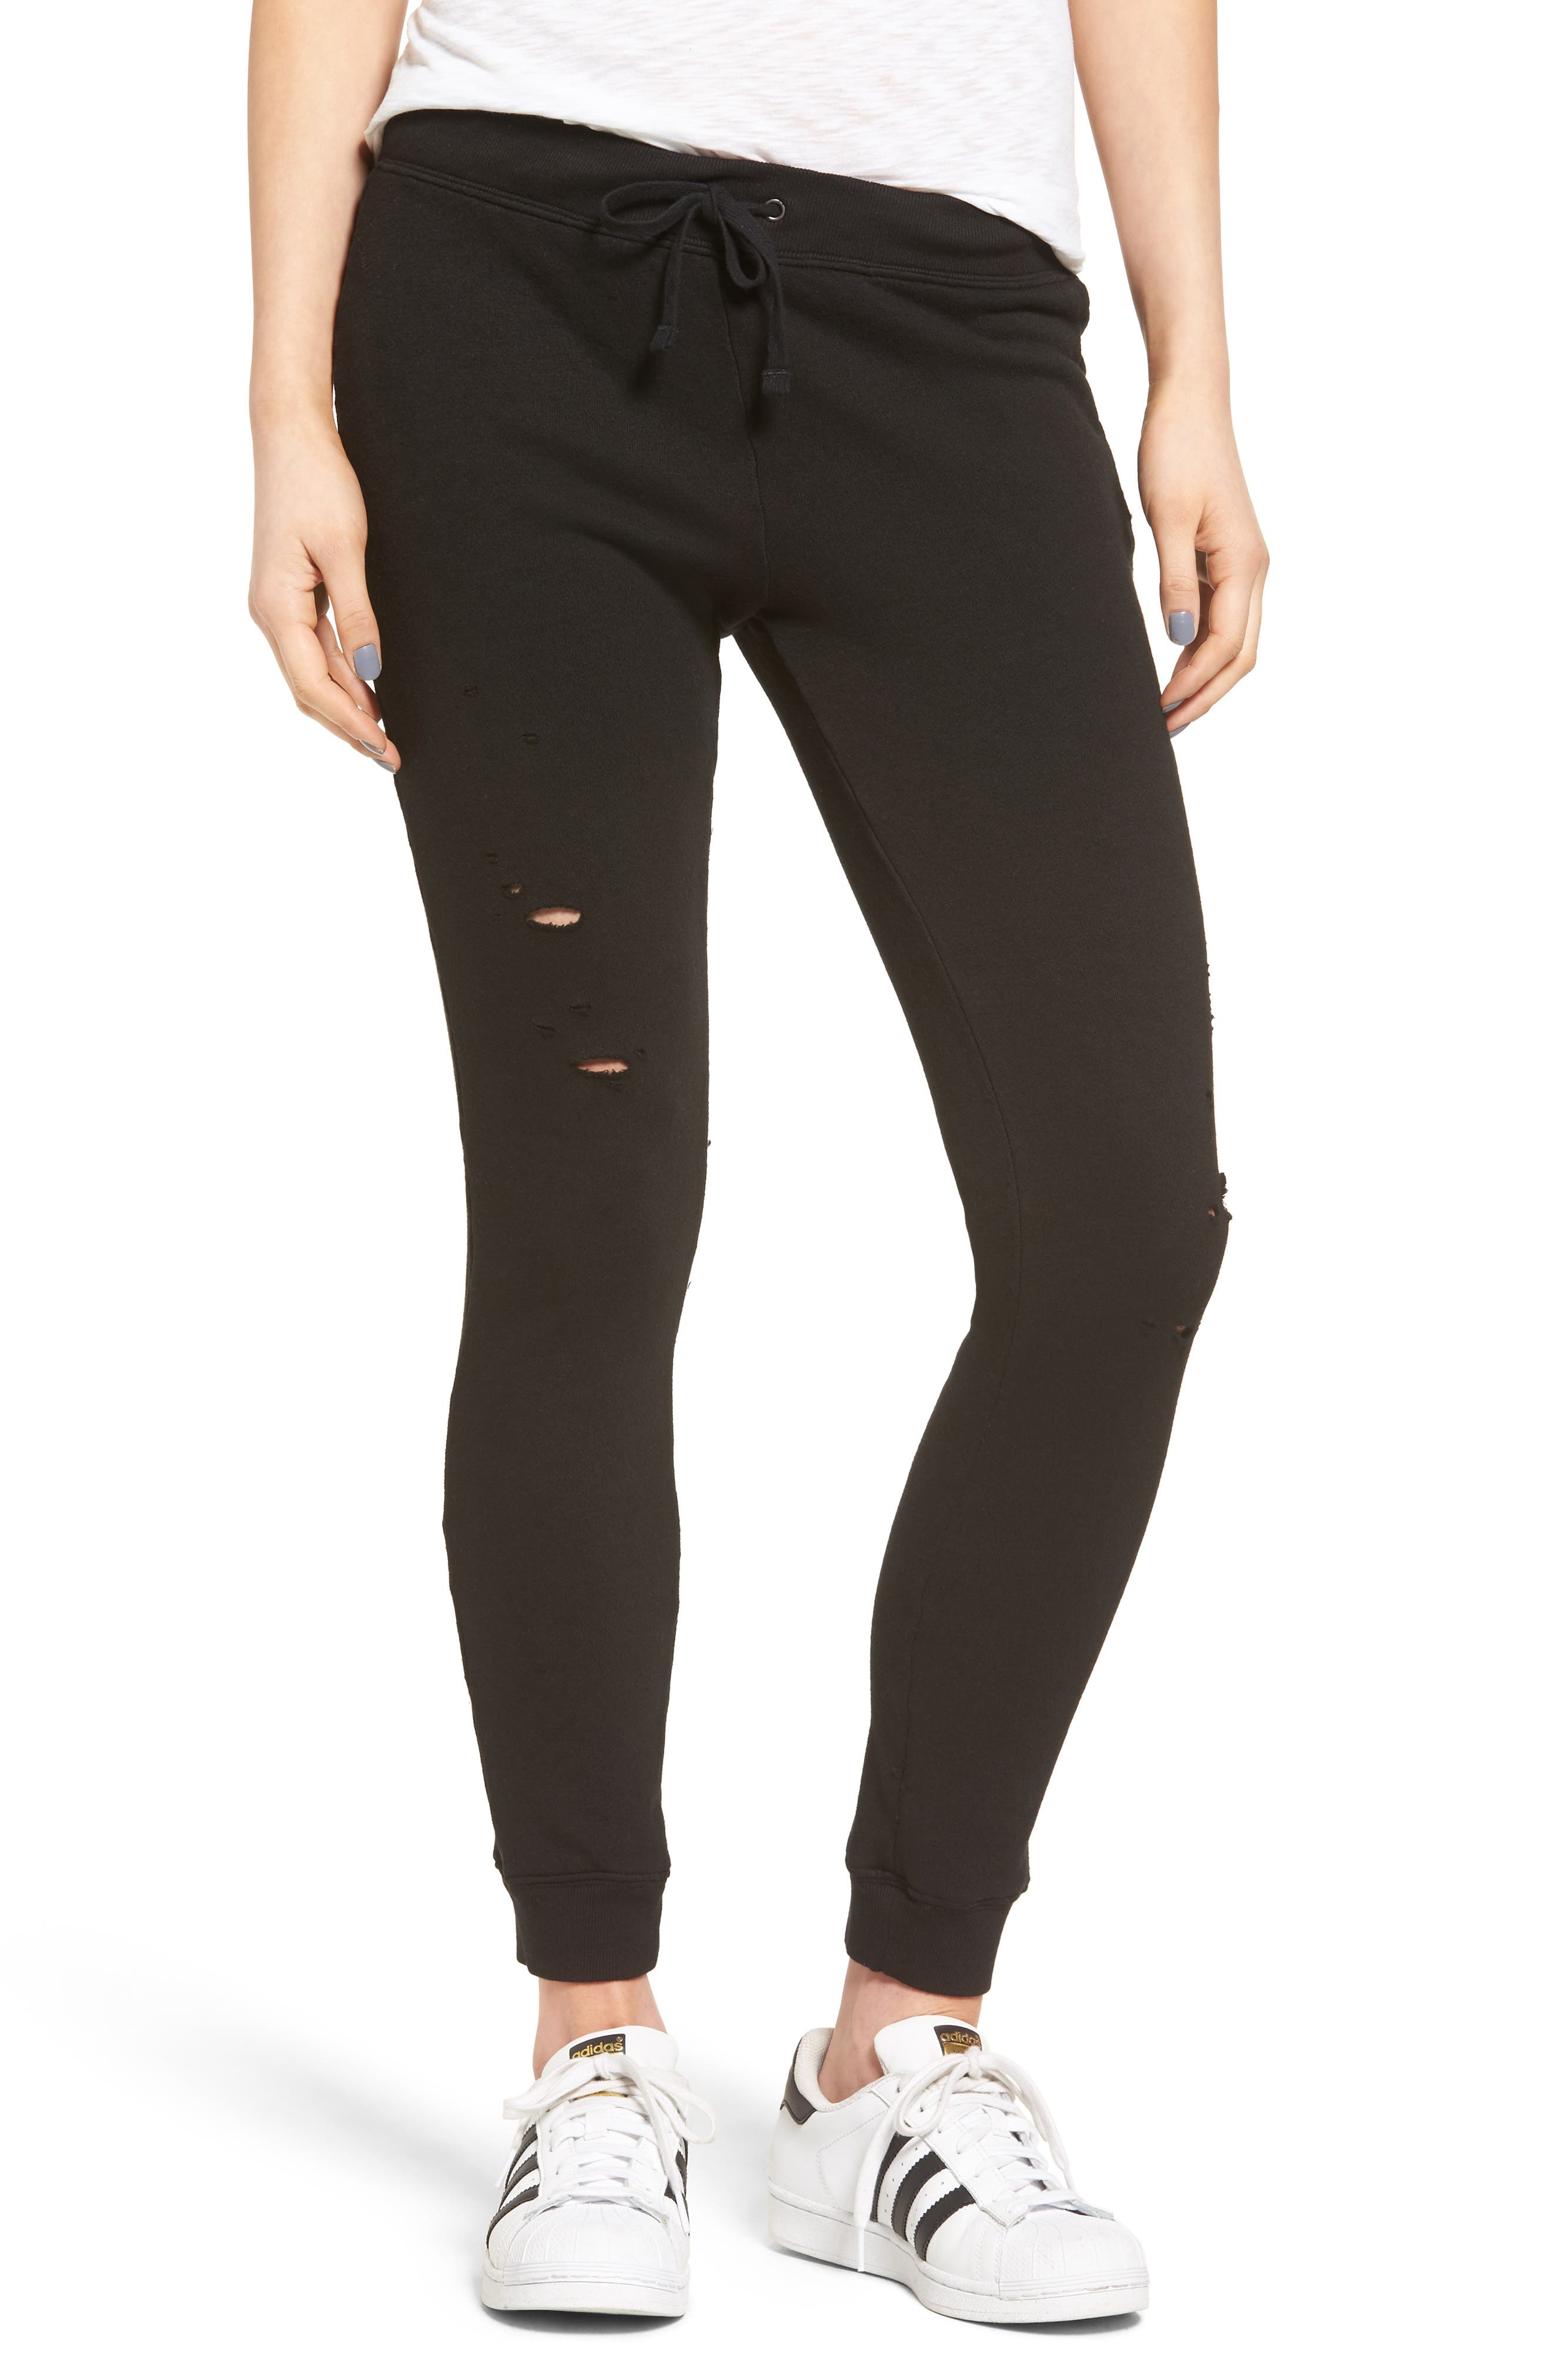 Alternate Image 1 Selected - Pam & Gela Betsee Distressed Jogger Pants